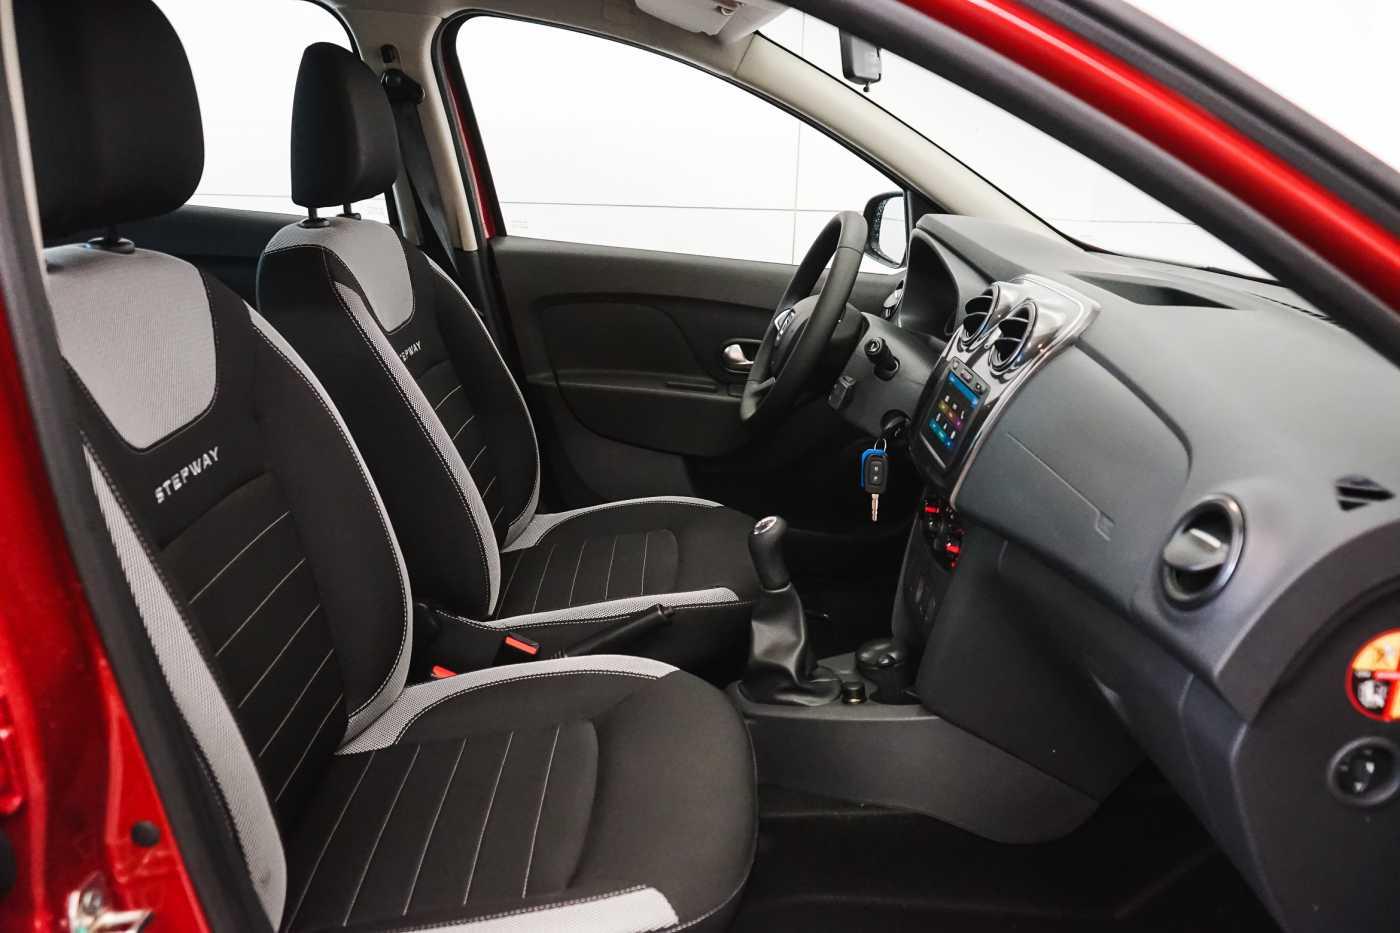 Dacia Sandero 1.0i SCe Stepway // Navi, Bluetooth, Airco, USB 9/27